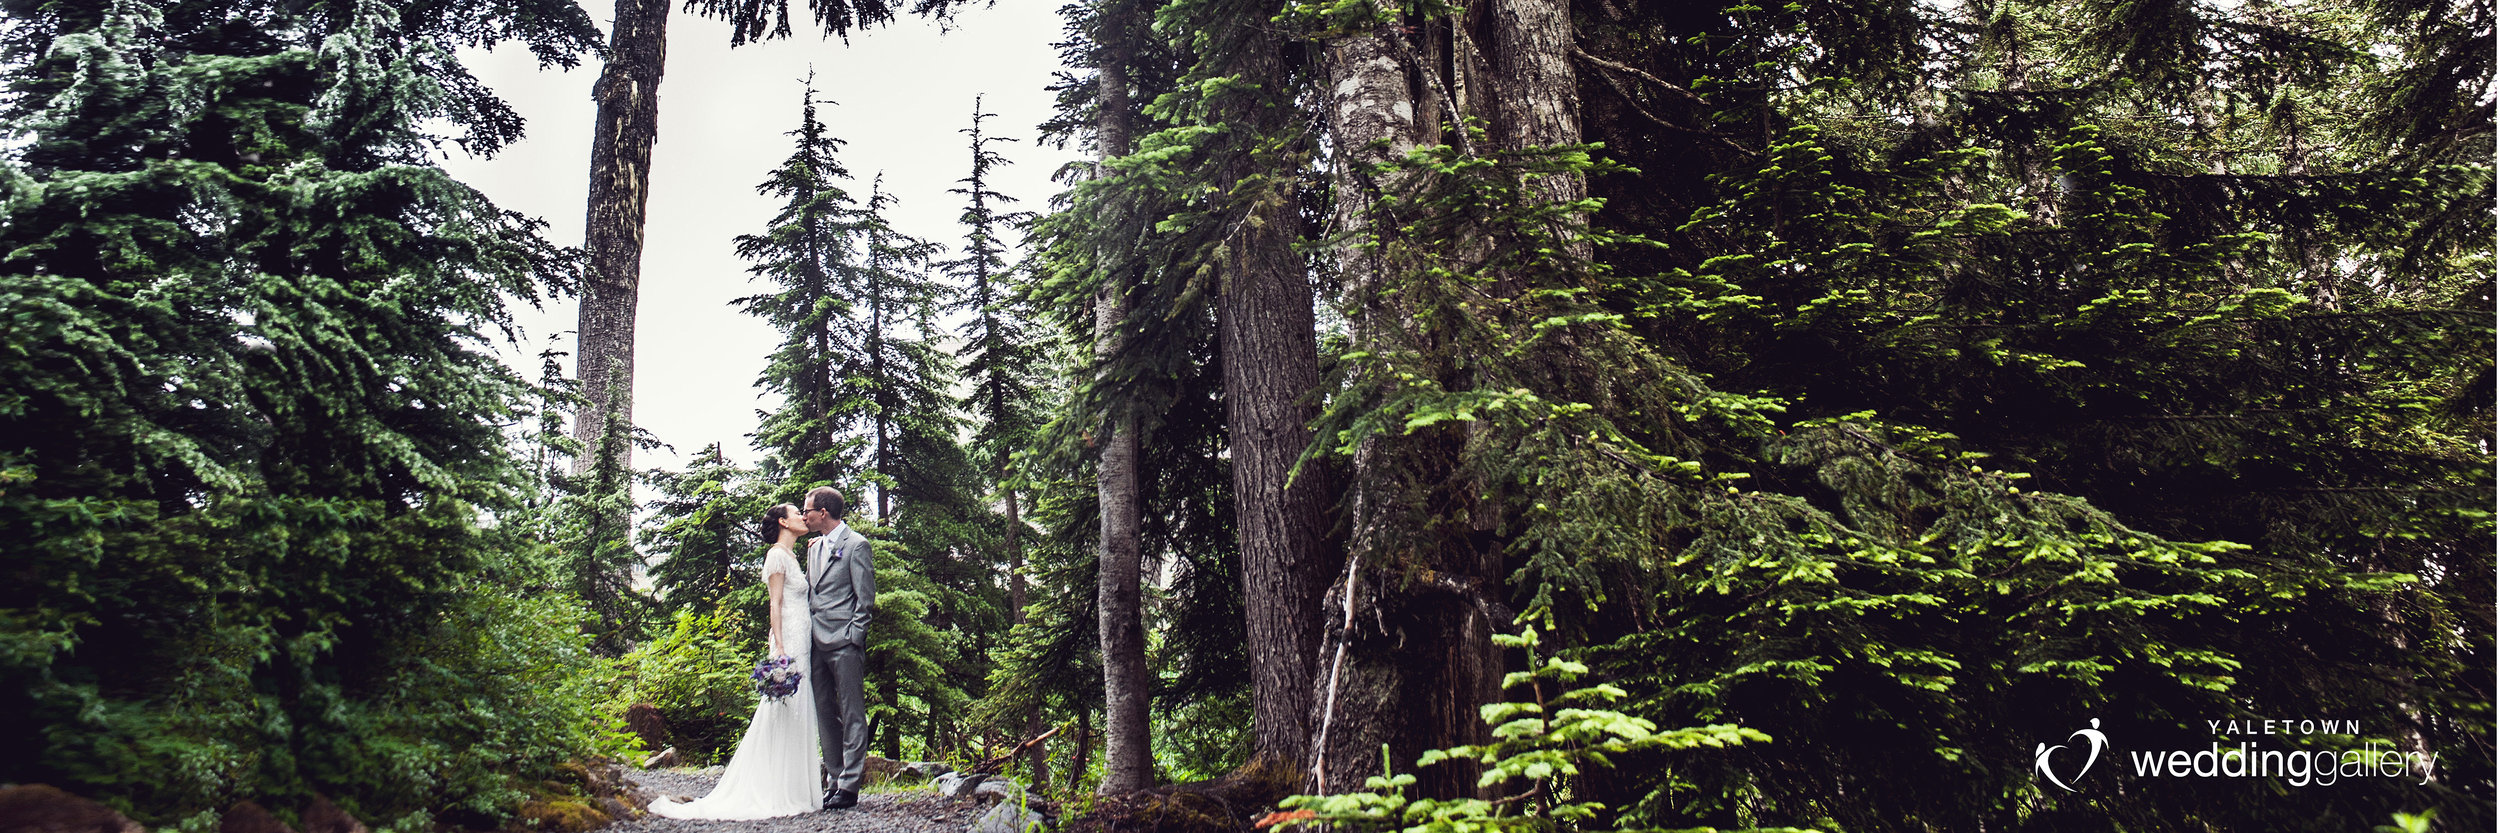 Andrea-Reuben-Grouse-Mountain-Wedding-Real-Weddings-Feature-Yaletown-Photography-016.jpg